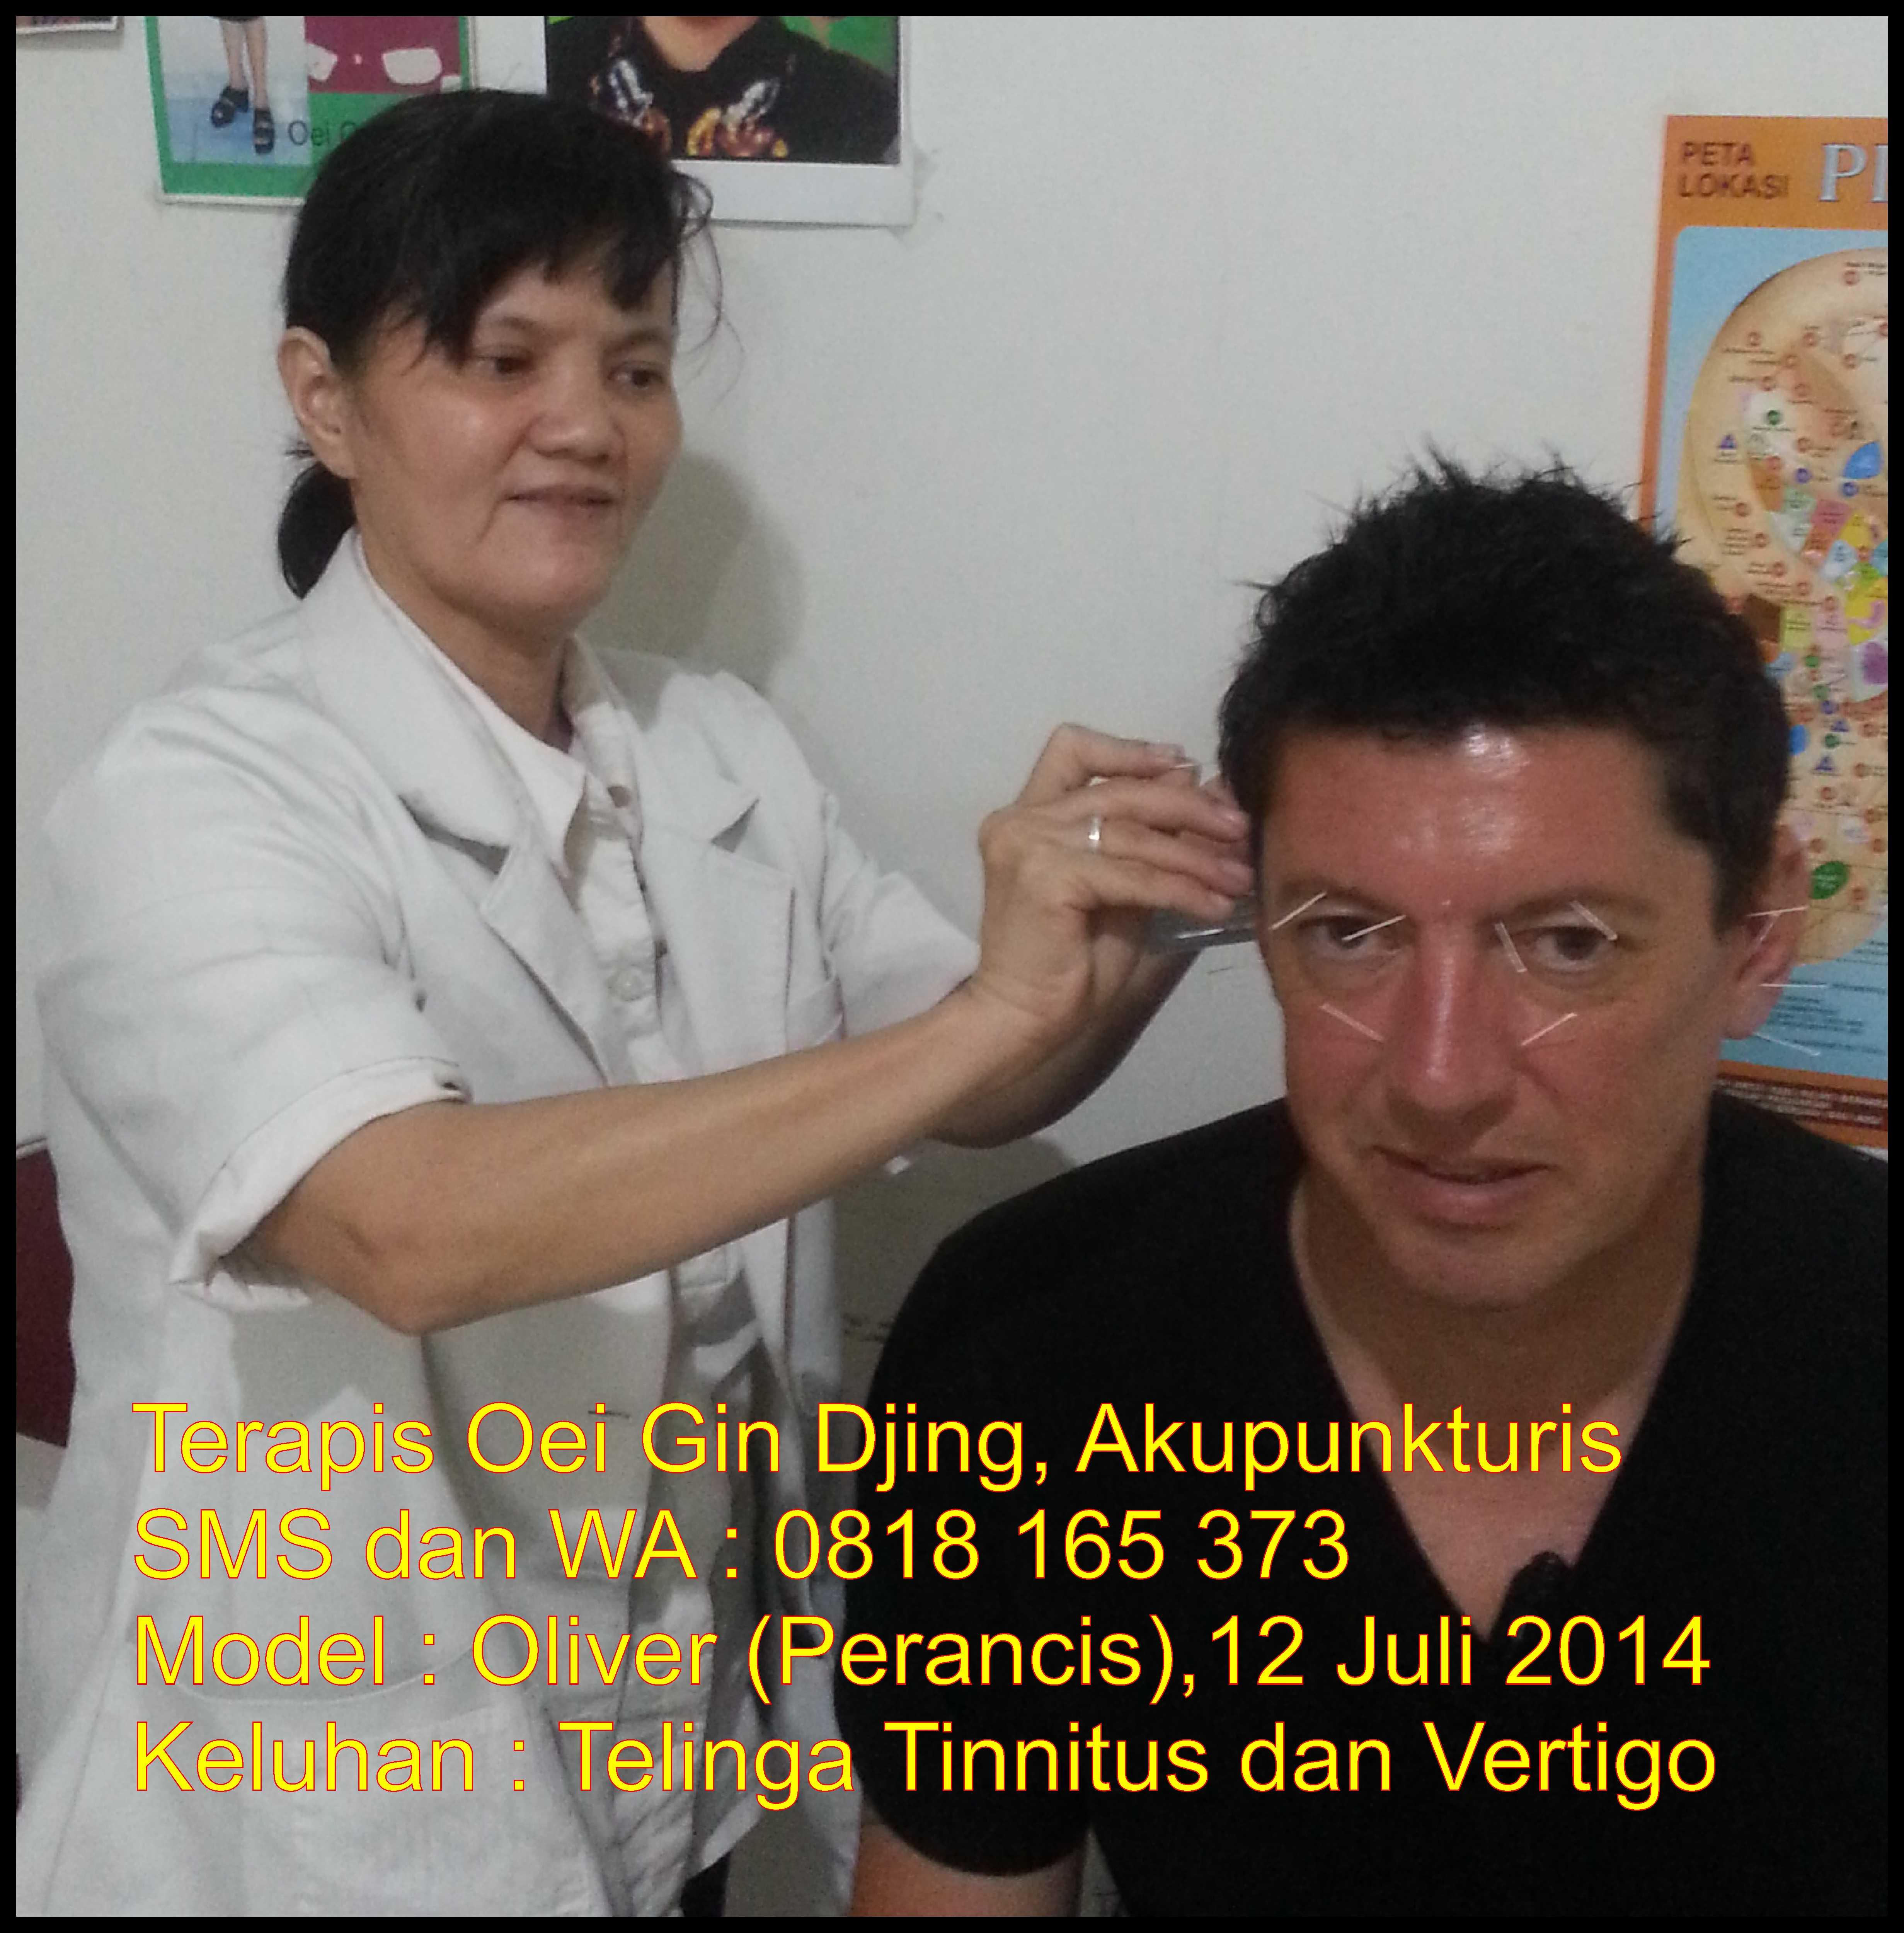 Batu Giok Asli Untuk Meringankan Tinnitus Oleh Oei Gin Djing